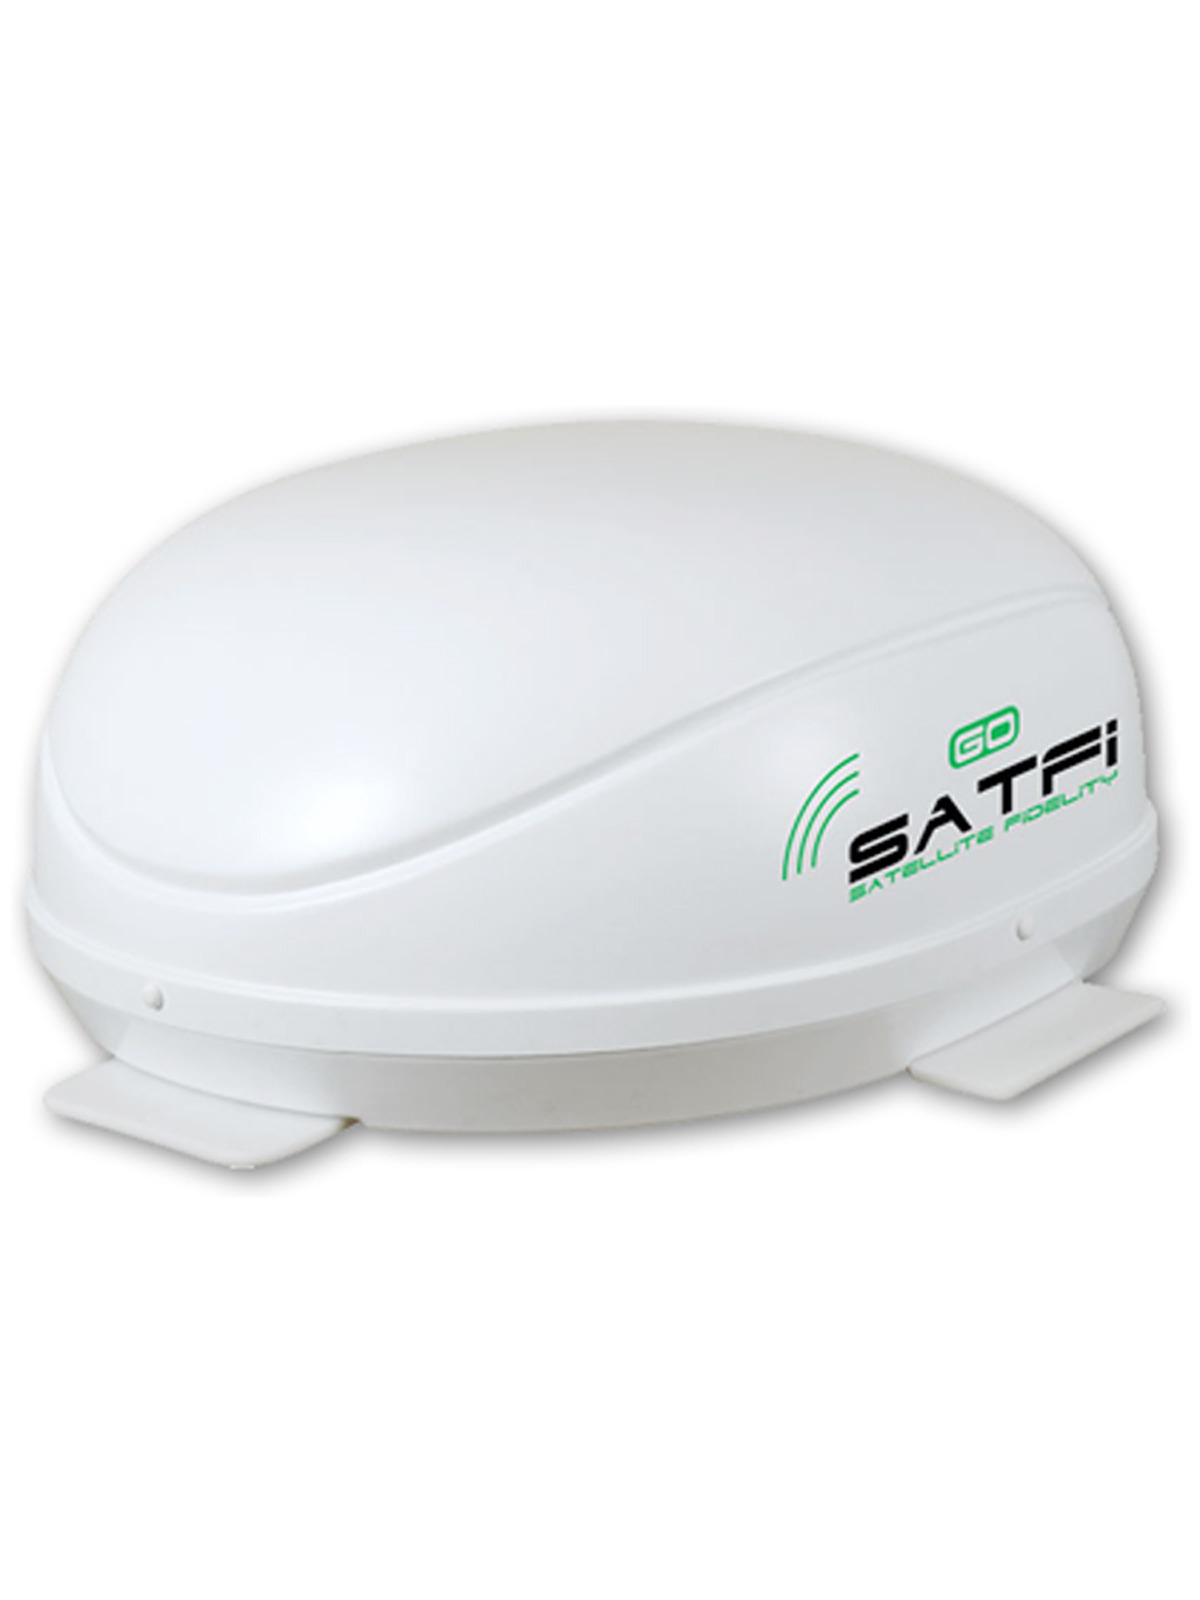 Satfi Rv Go Aerotrac